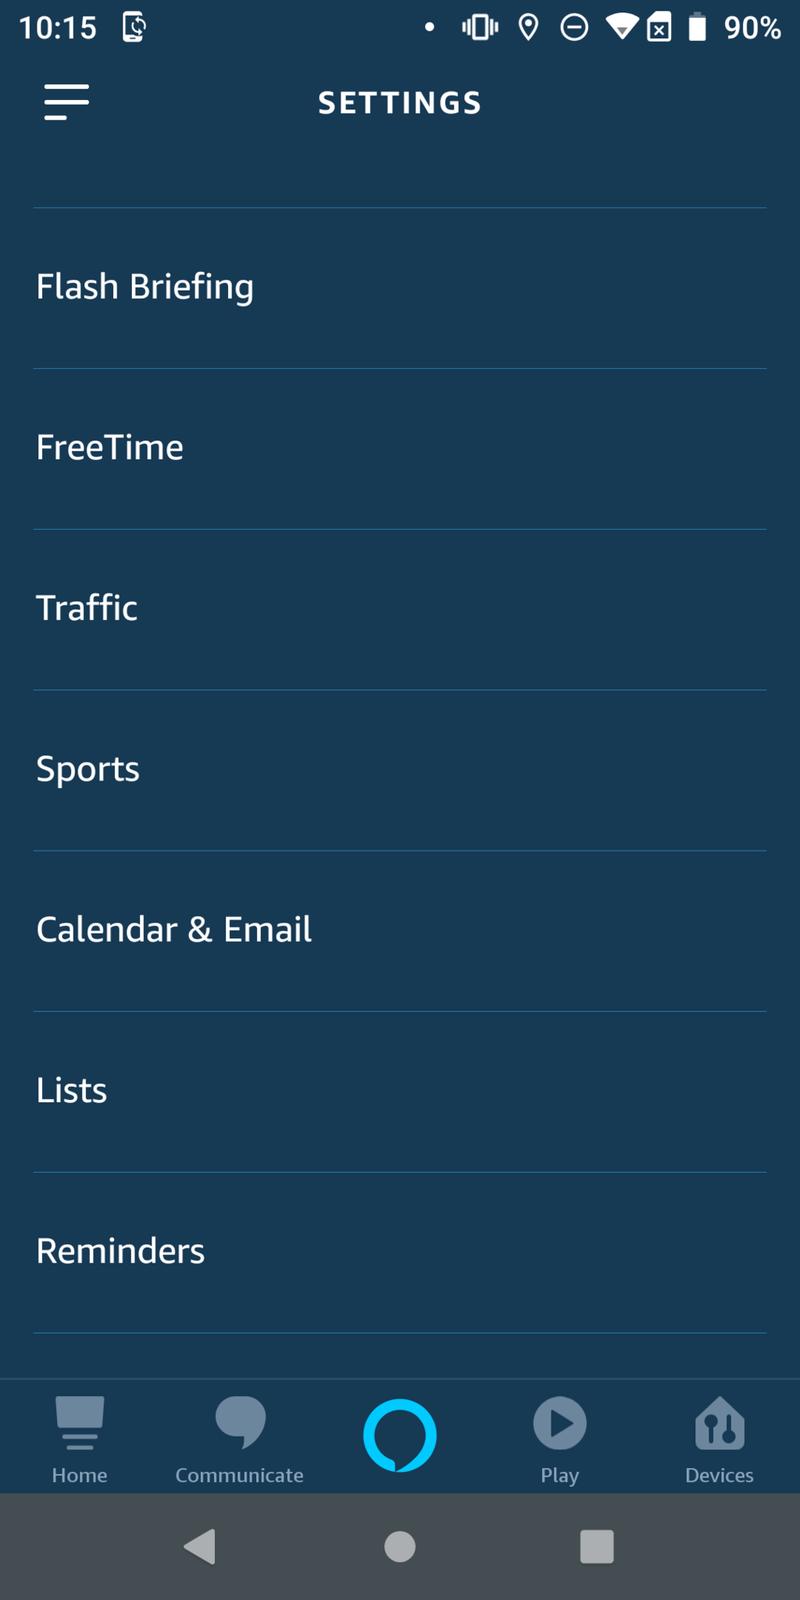 alexa-app-sports-1.png?itok=57C8R4gP